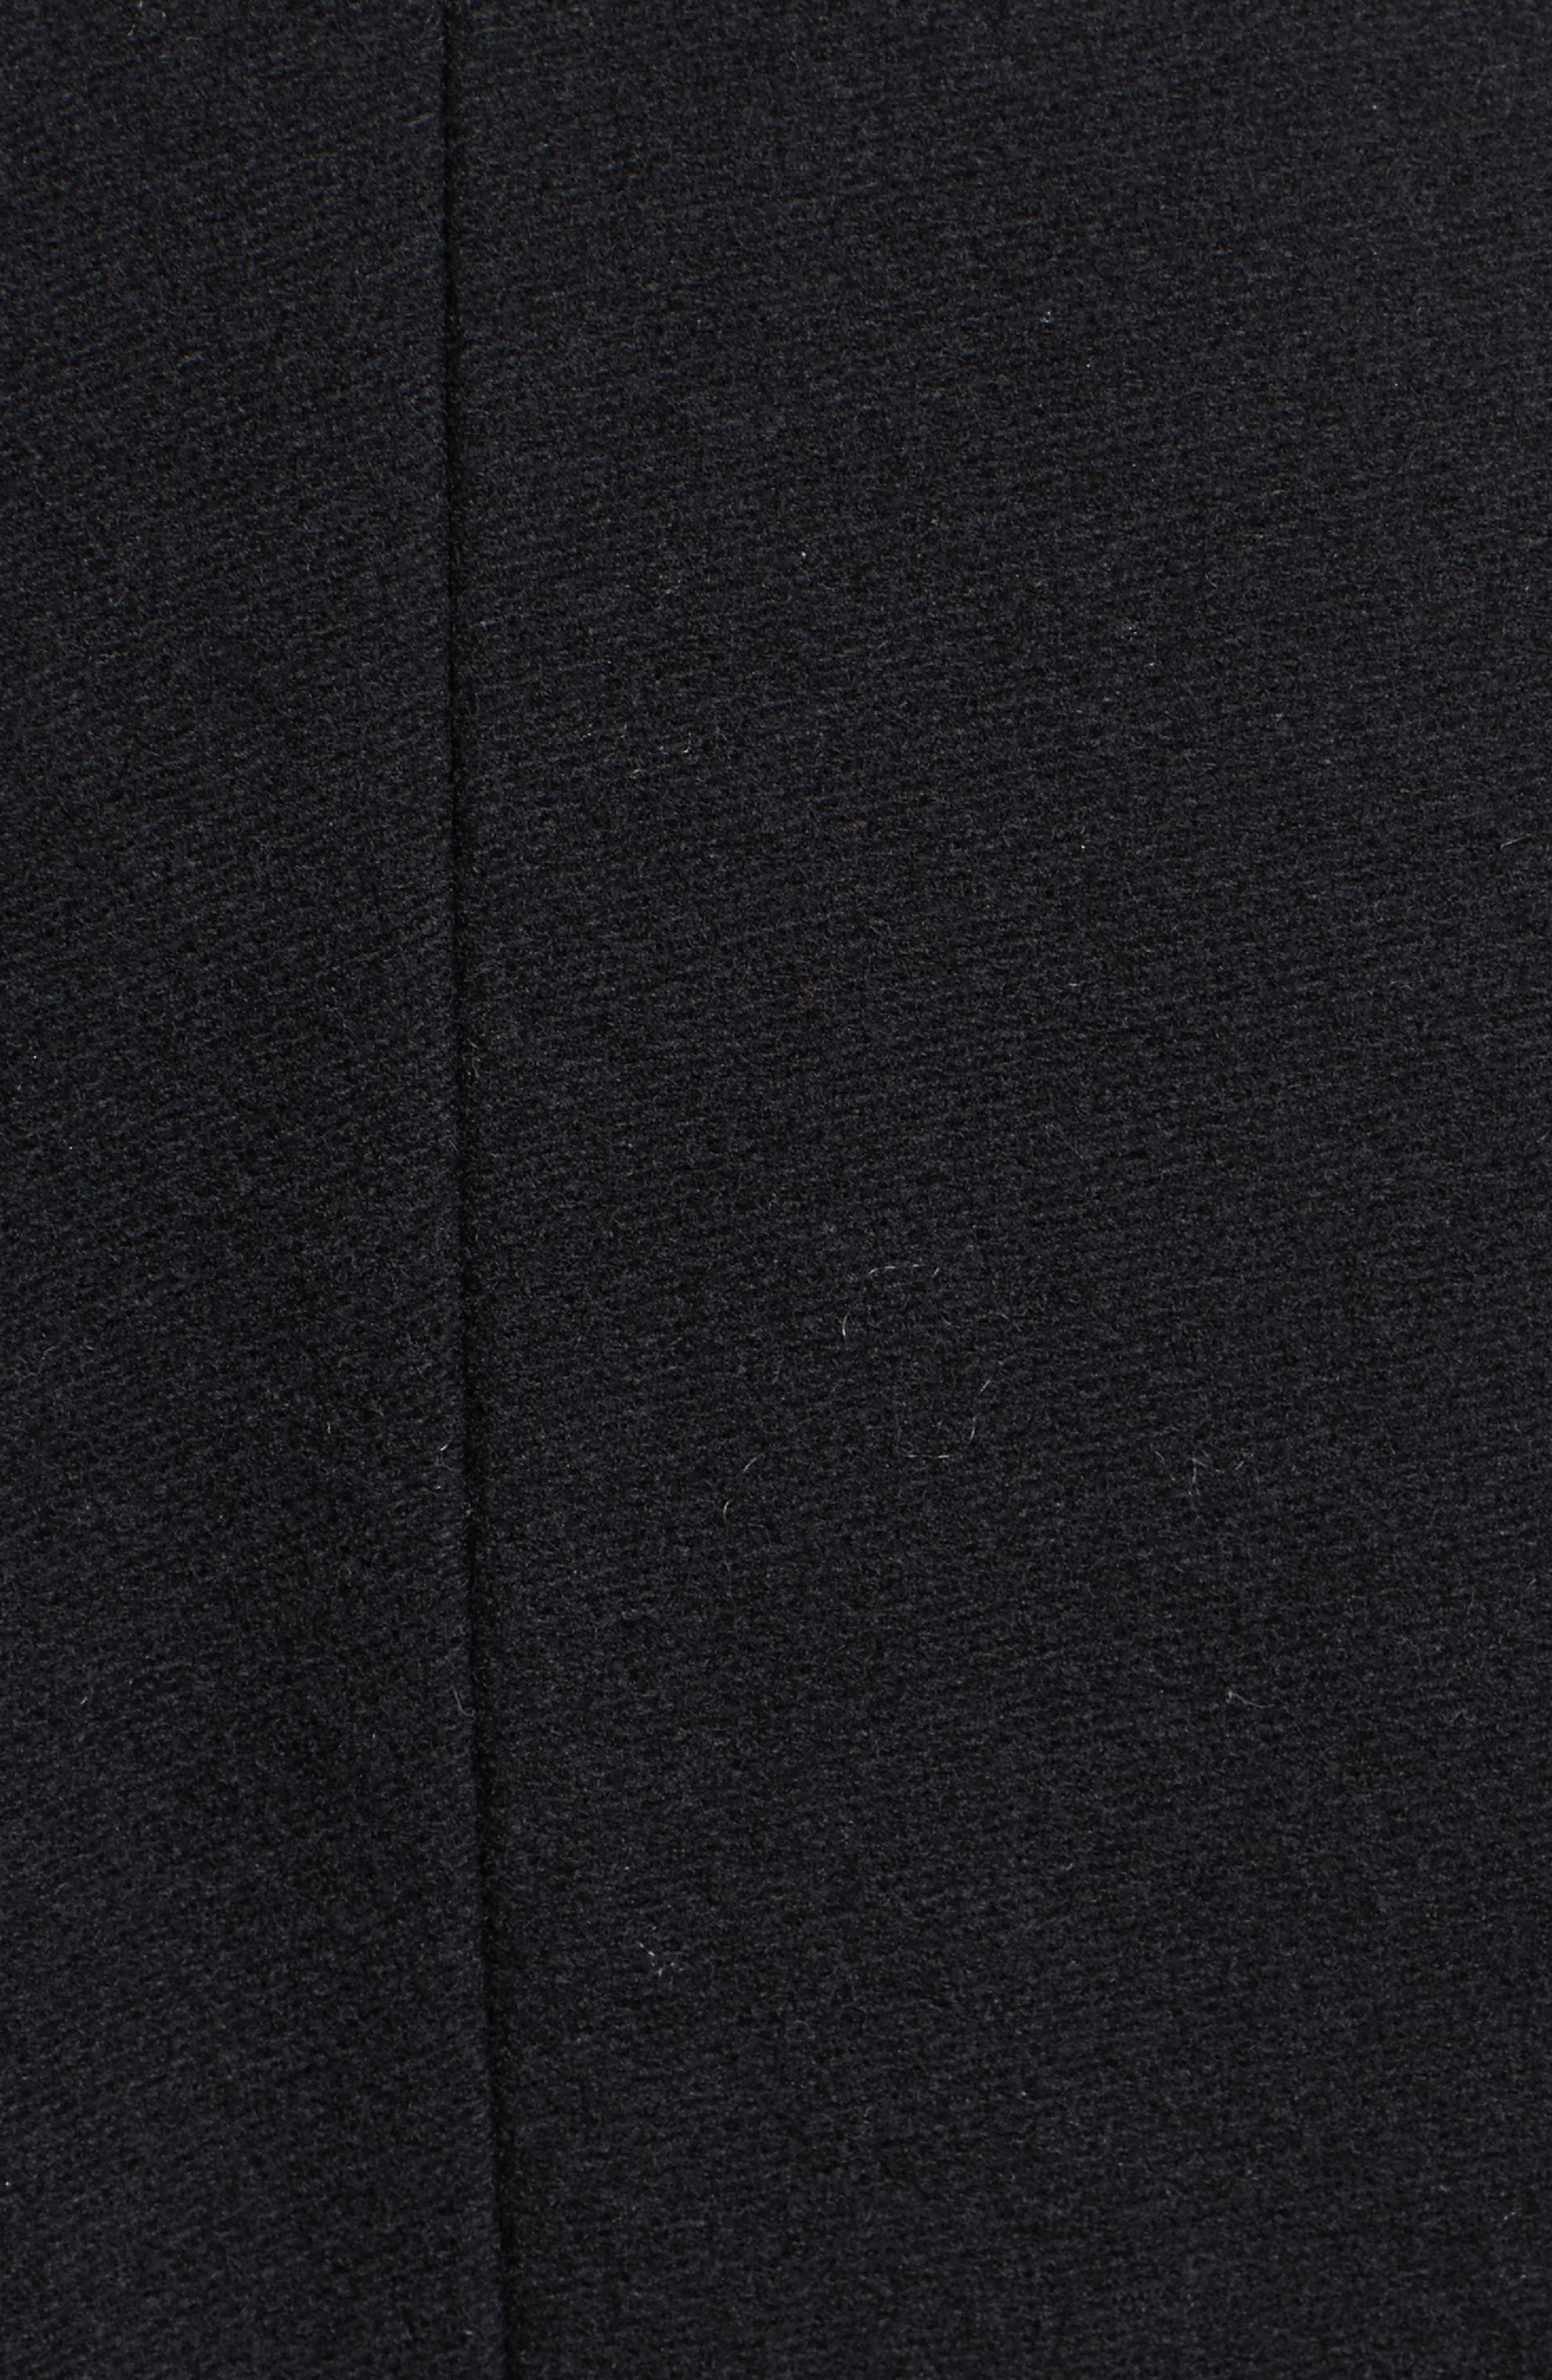 Alvingham Wool Blend Jacket,                             Alternate thumbnail 7, color,                             001